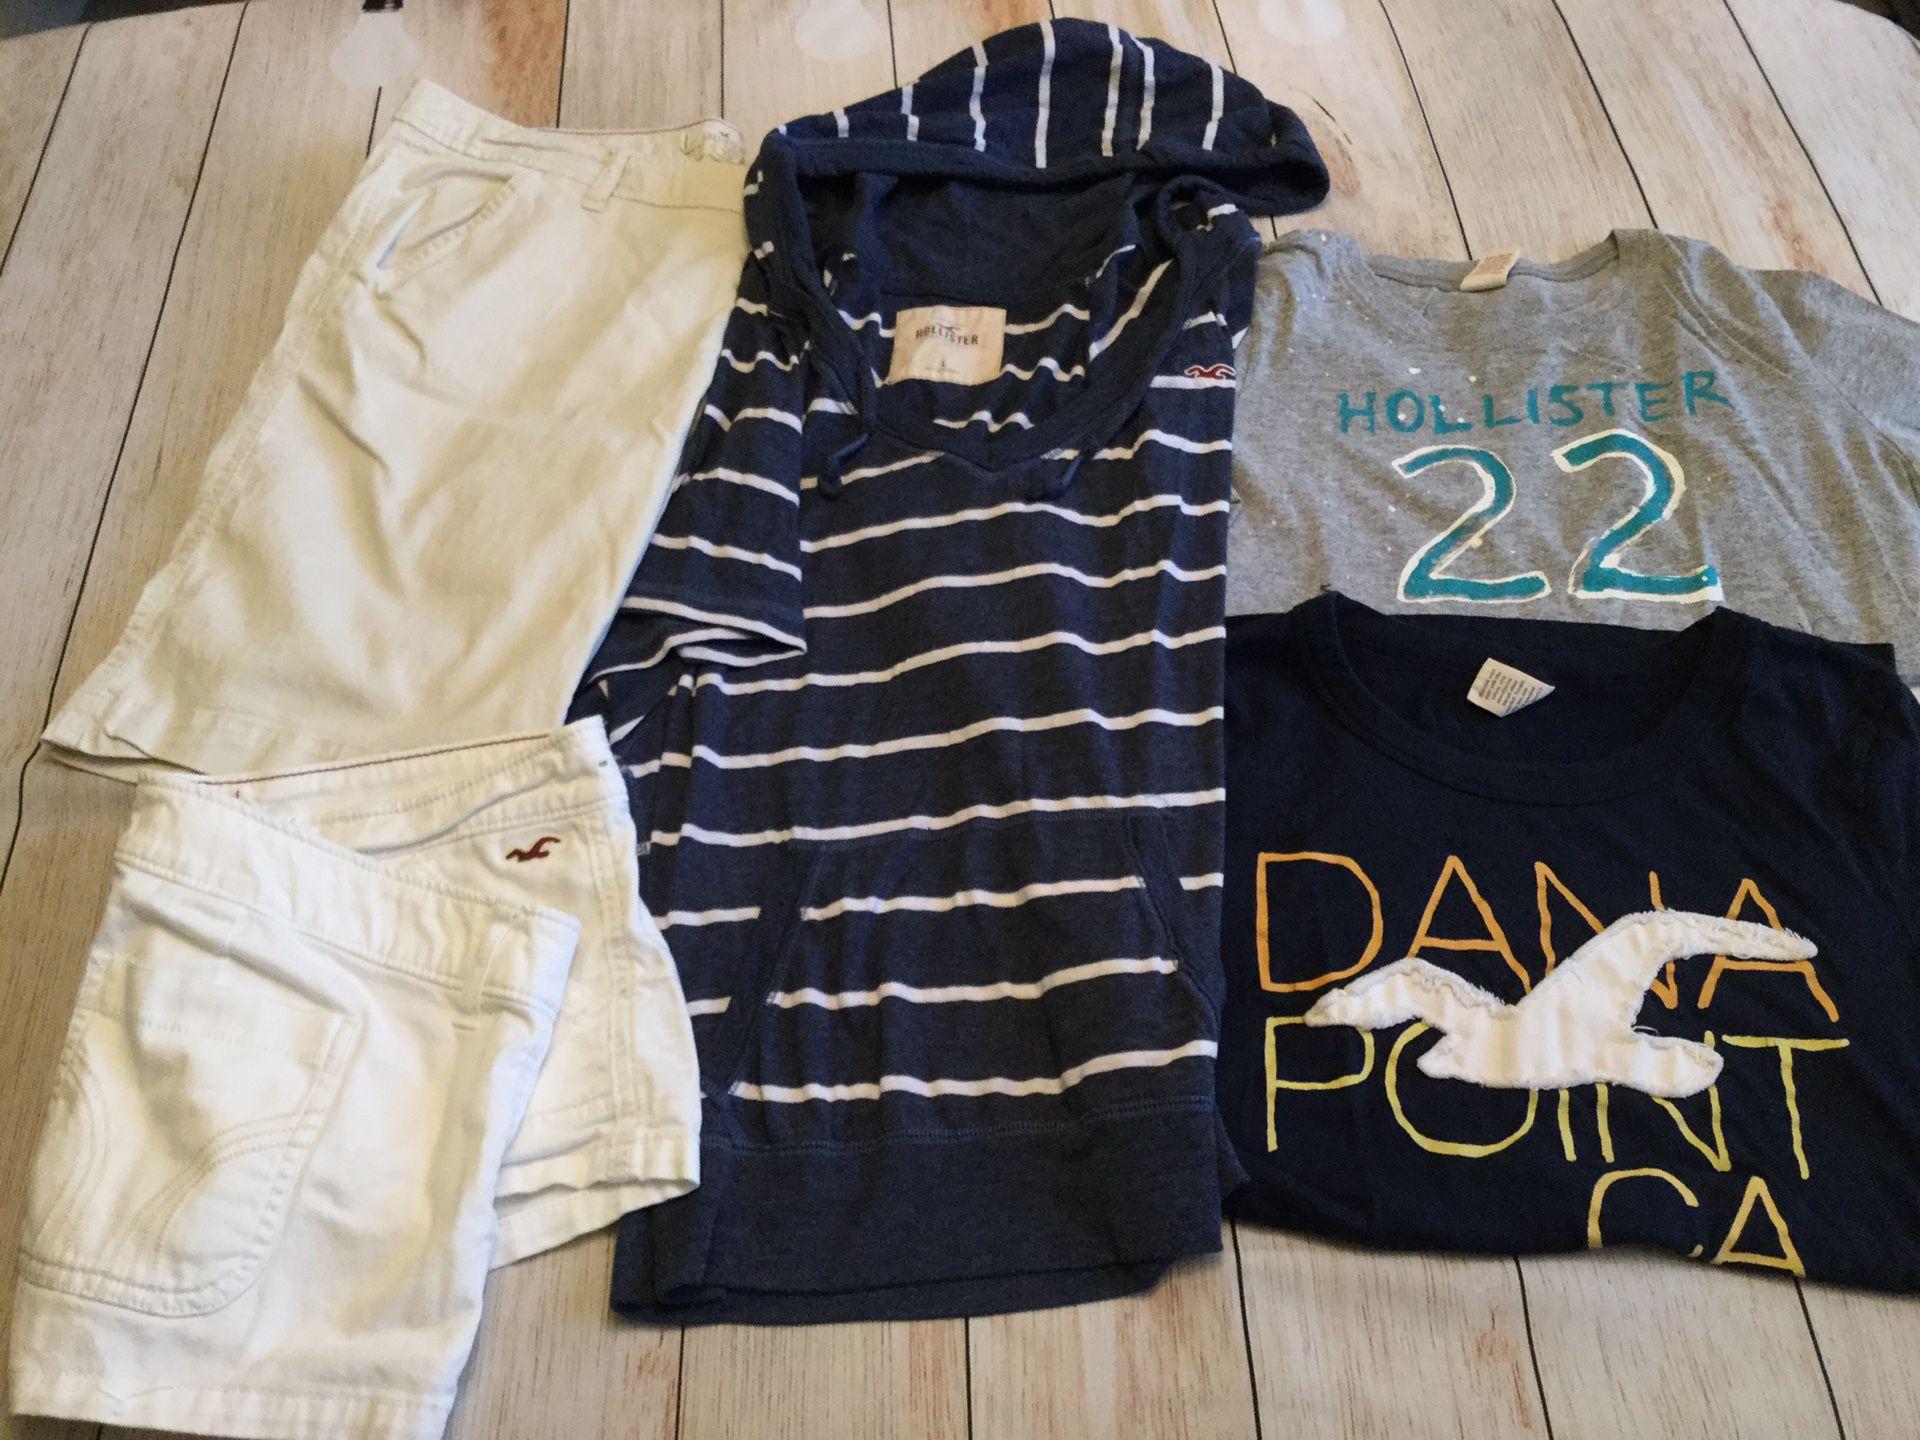 Hollister Bundle Lot of 5 — 2 size 11 shorts, 2 Tee's & 1 hoodie Tee (Jr's Med/Lg)